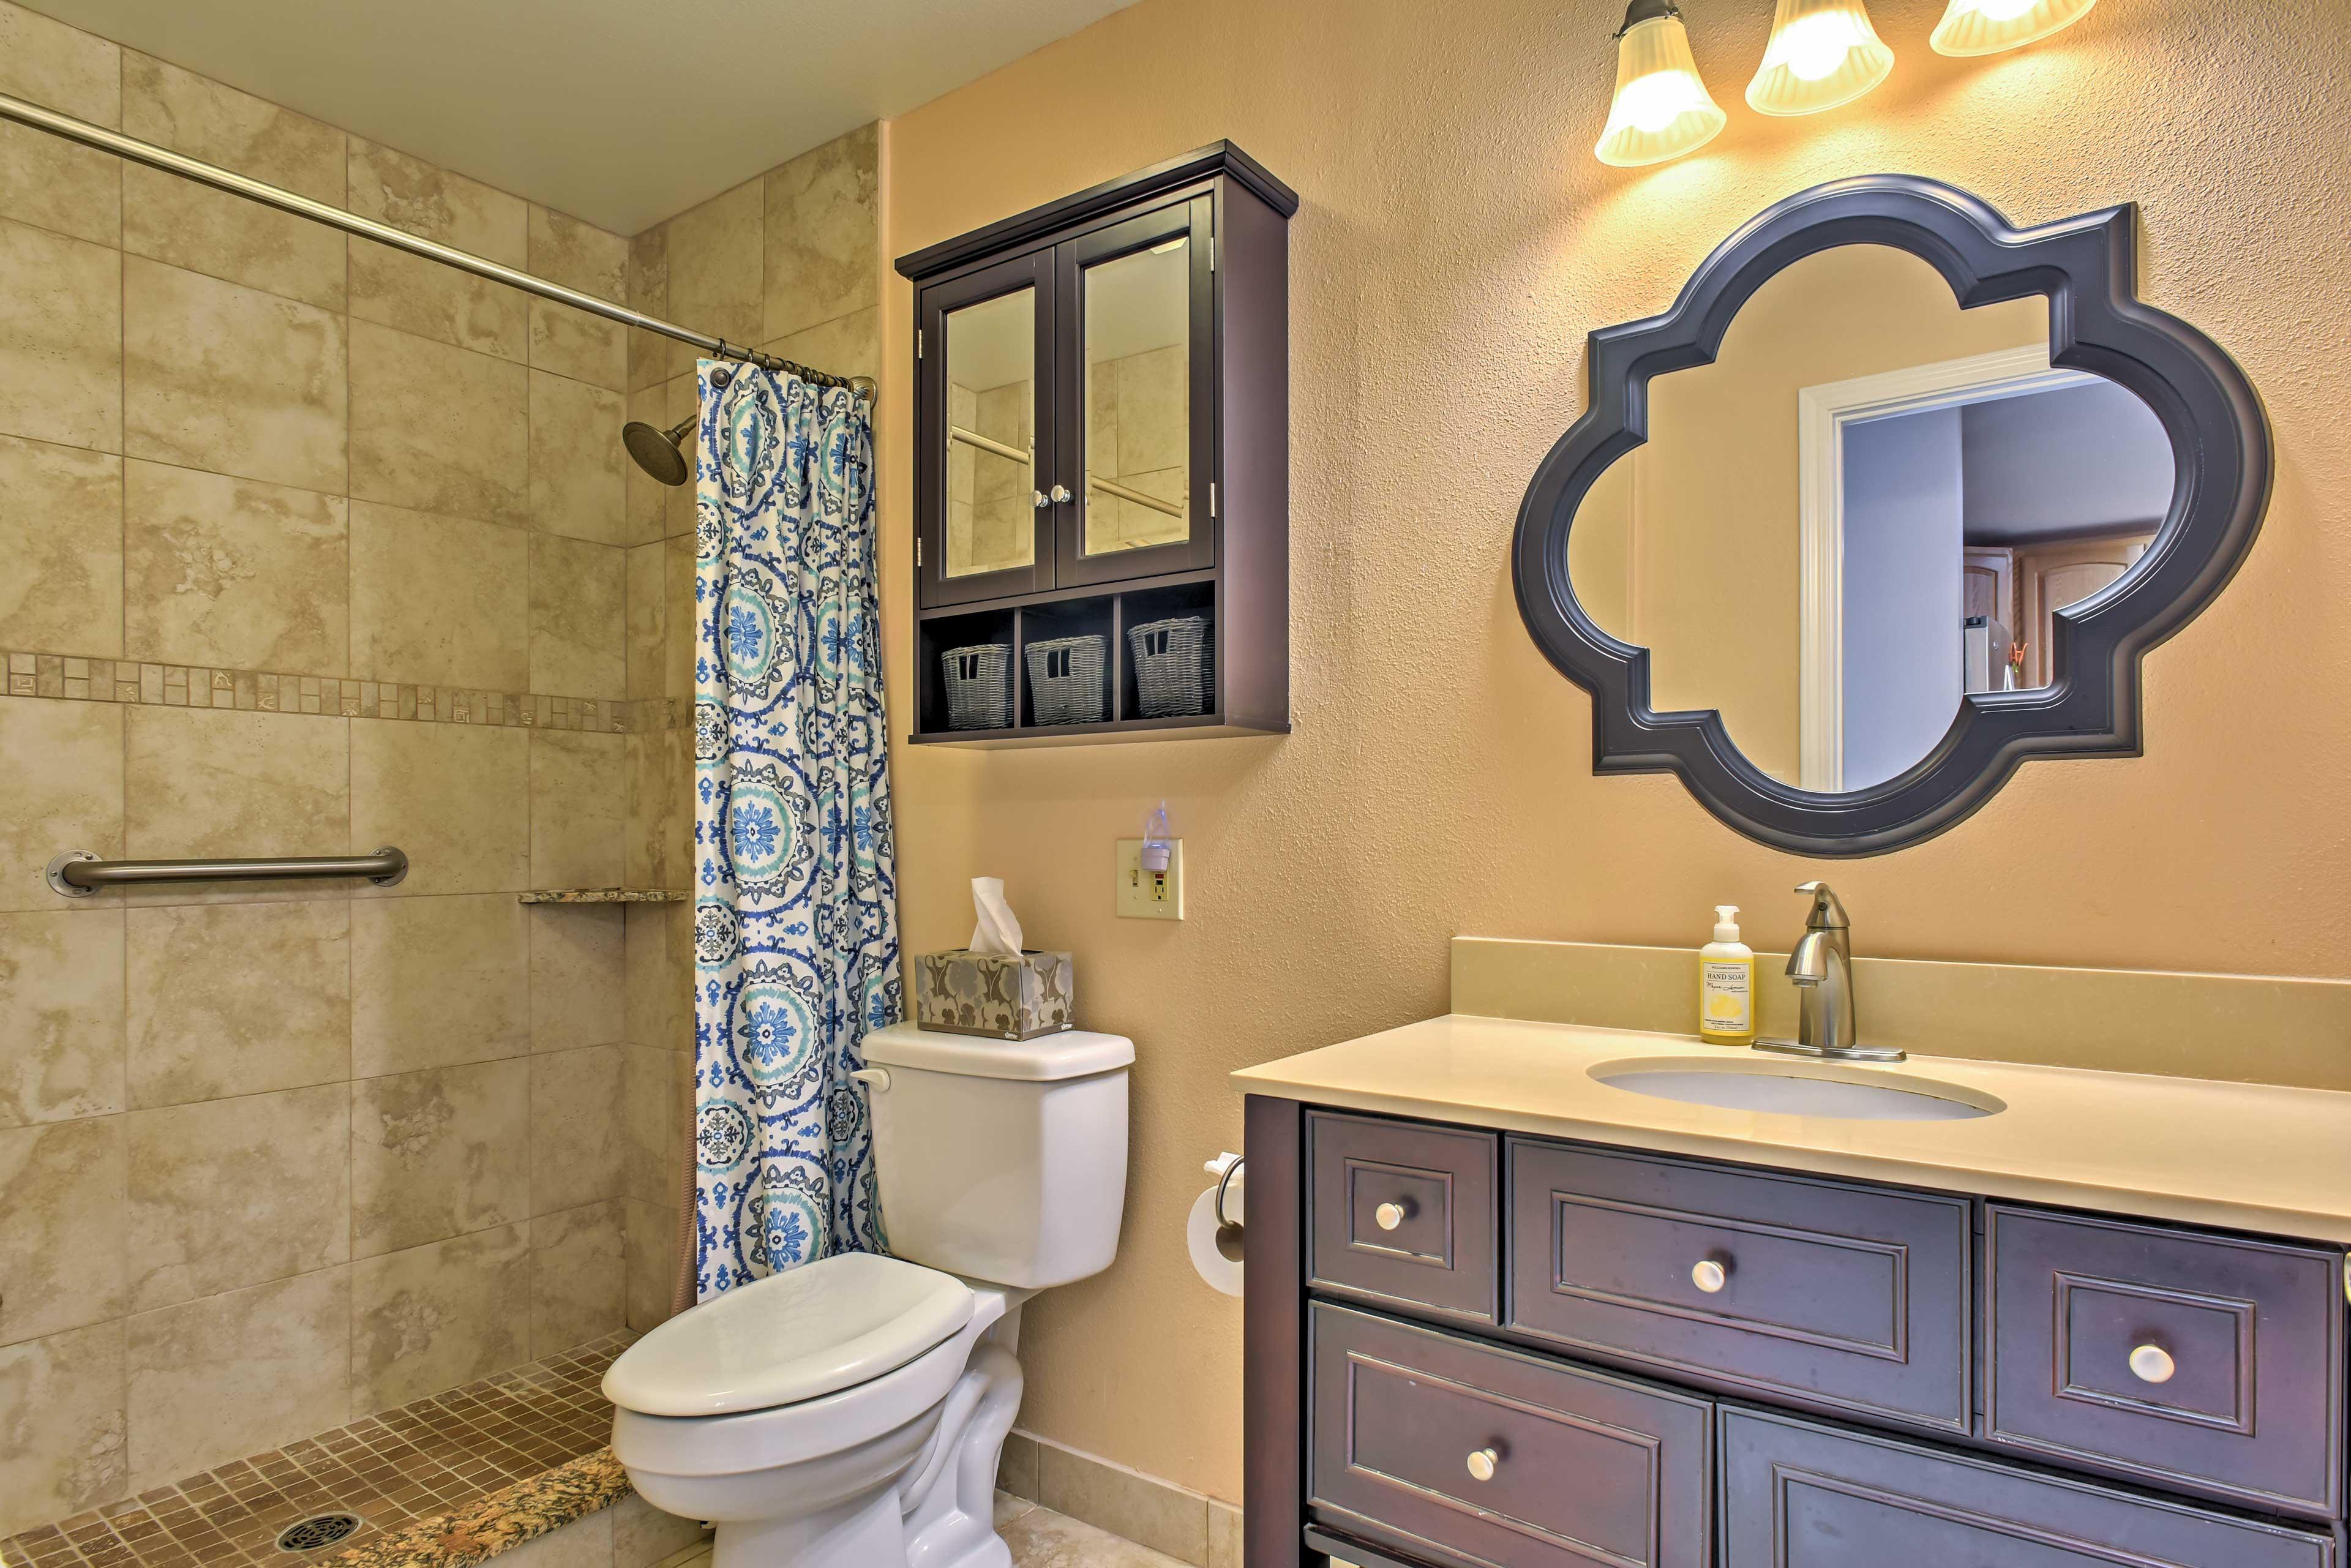 The condo has 1 bathroom with brand new fixtures.